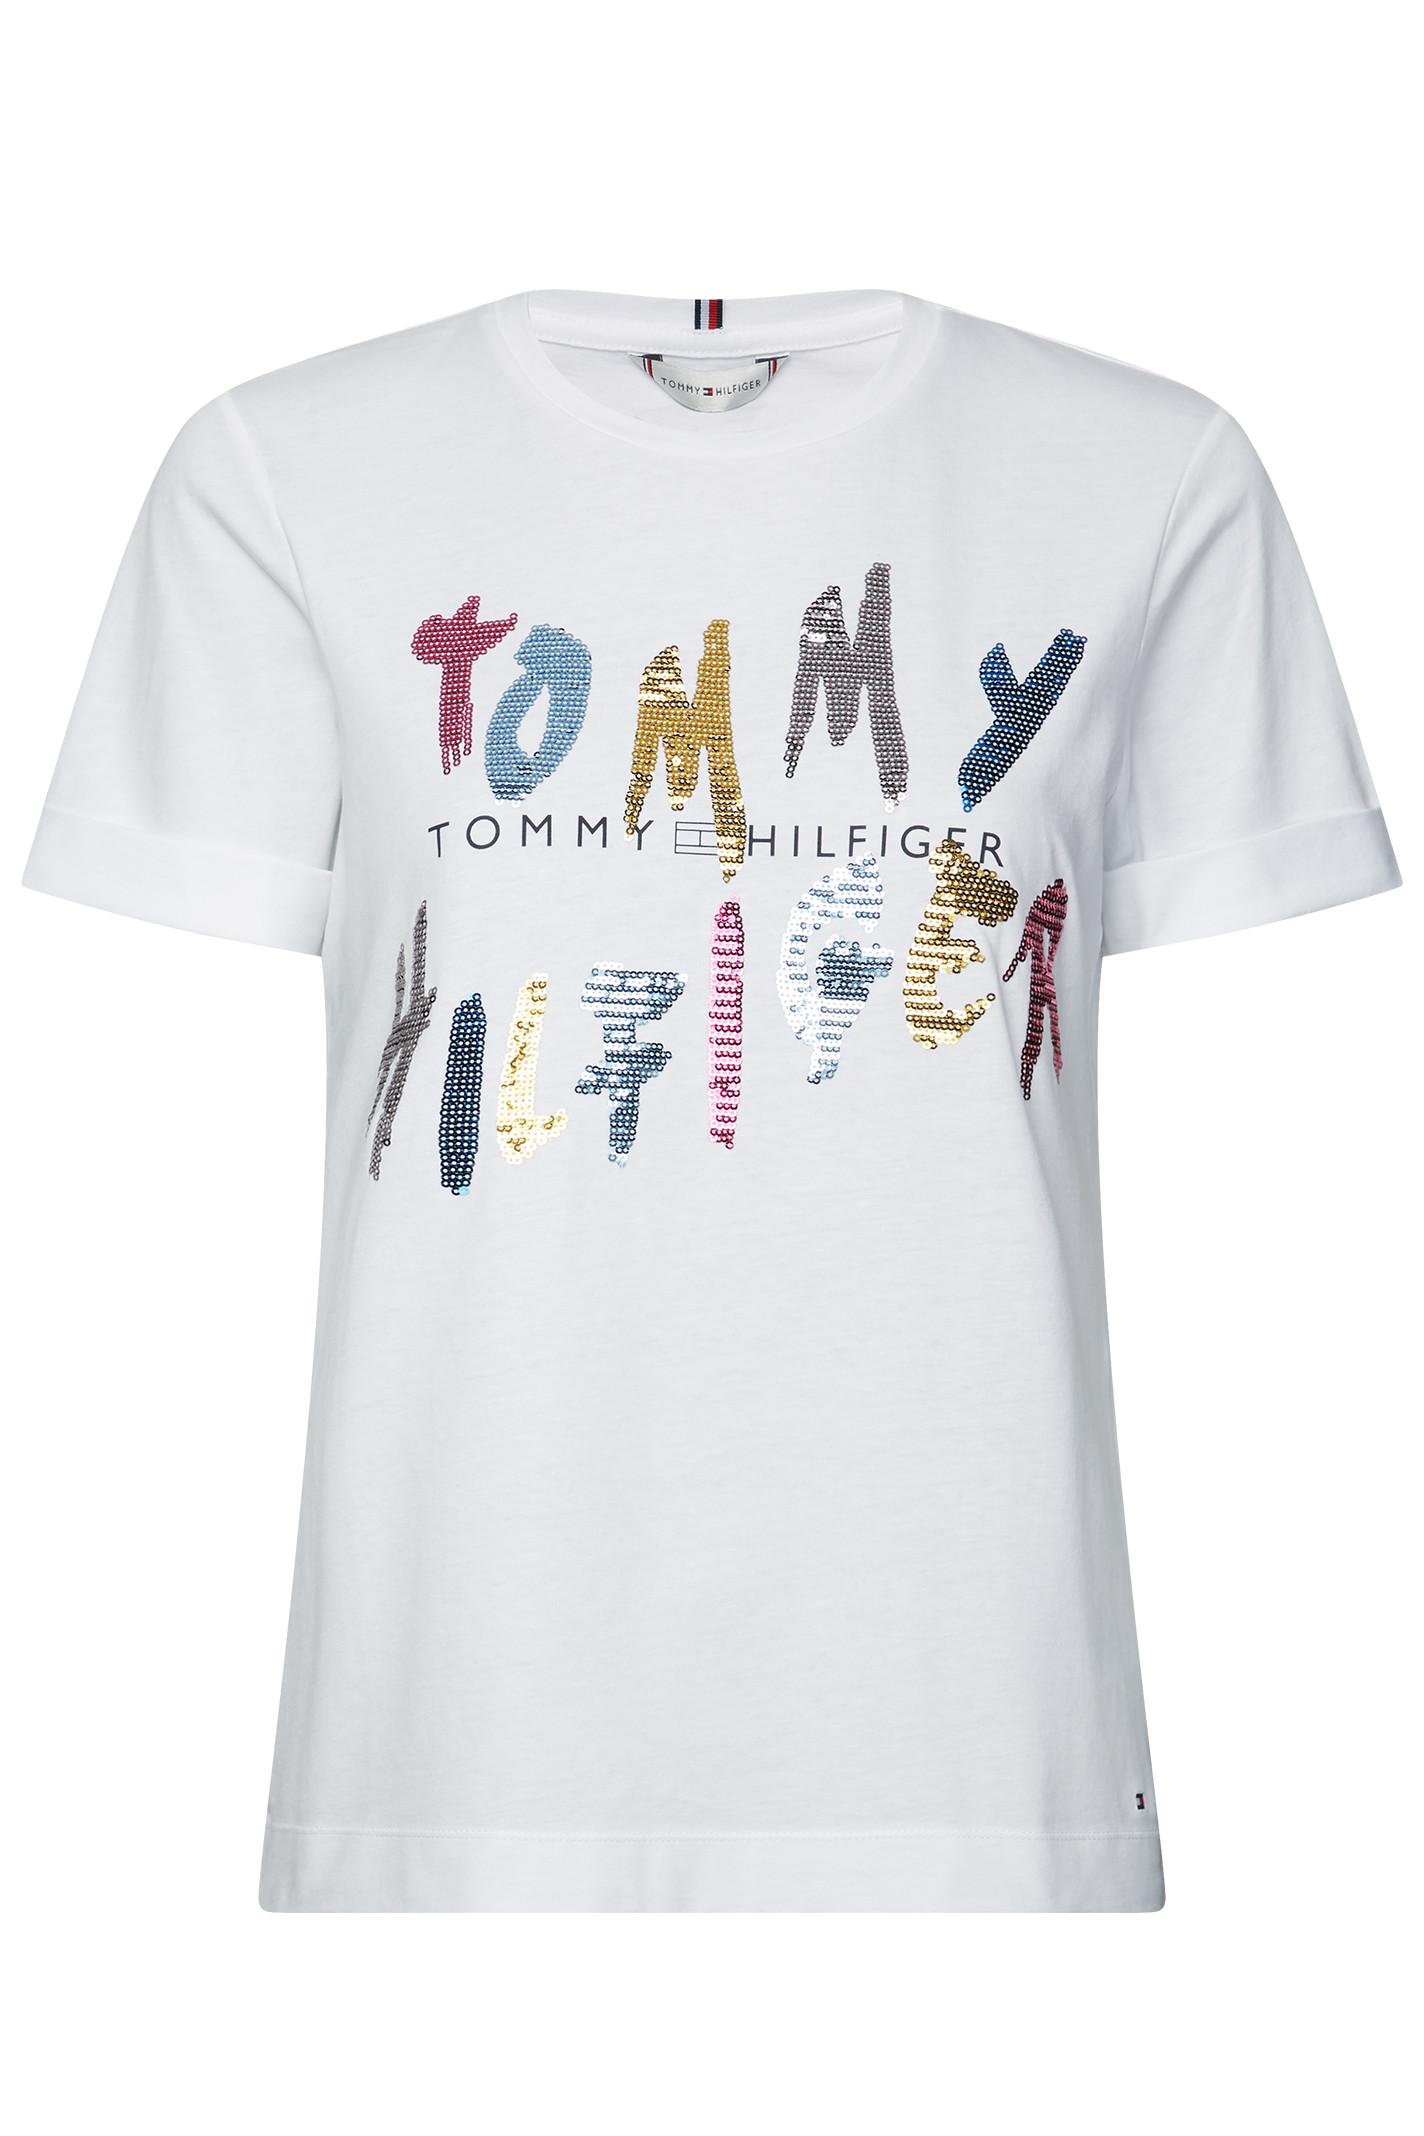 TOMMY HILFIGER ROXY C-NK TEE SS 26671 HVID